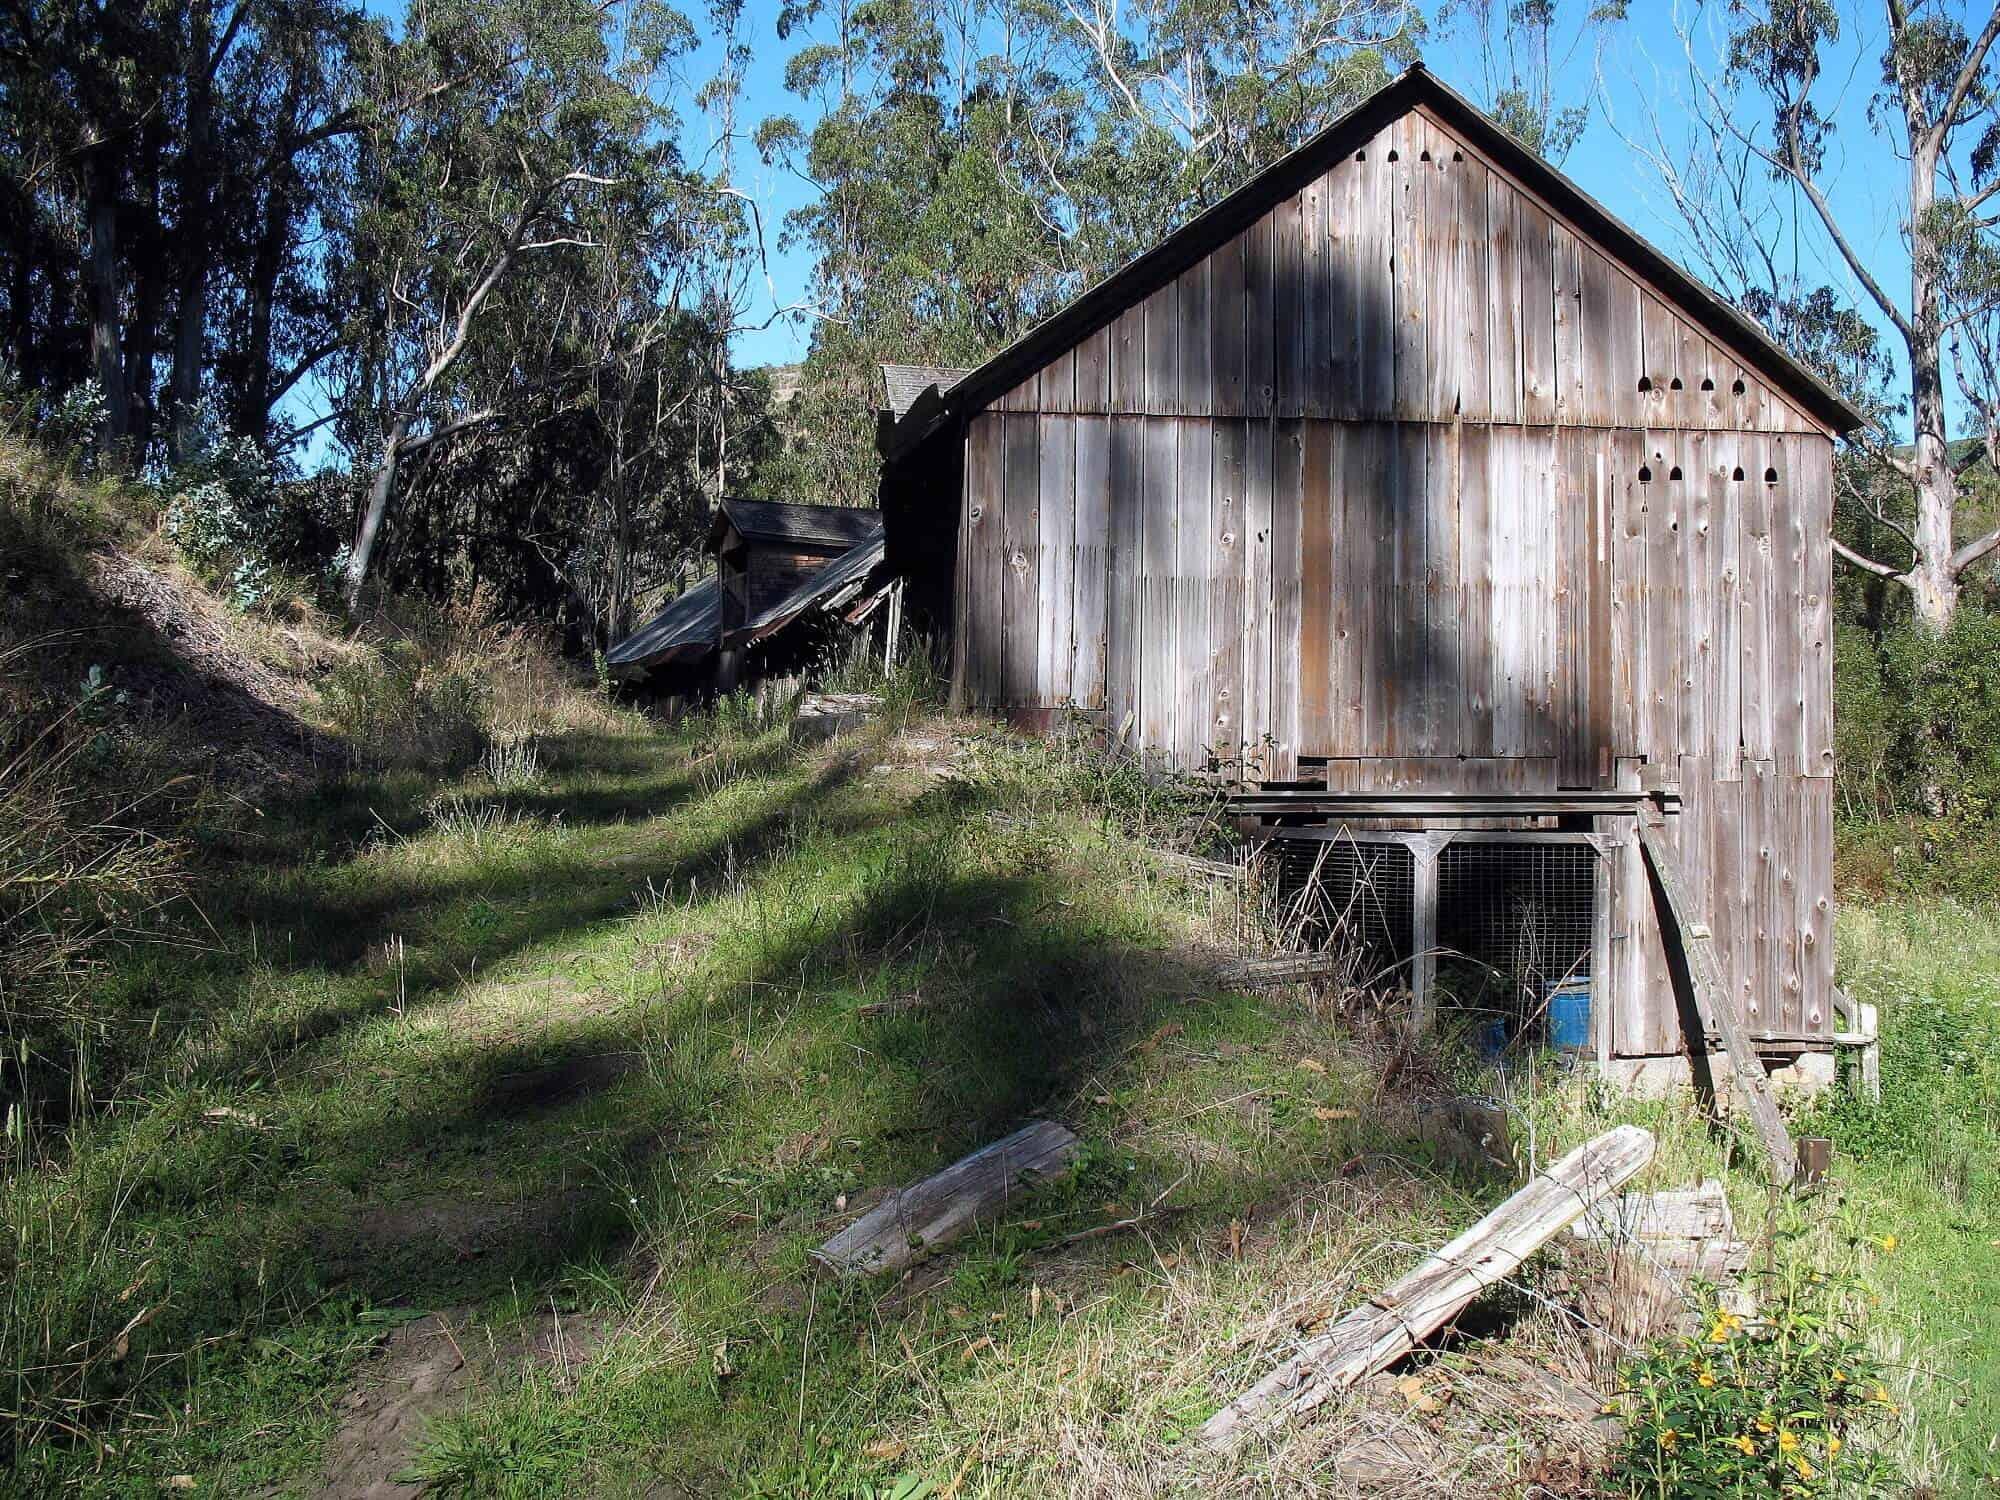 Mills Dairy Barn at Burleigh Murray Ranch